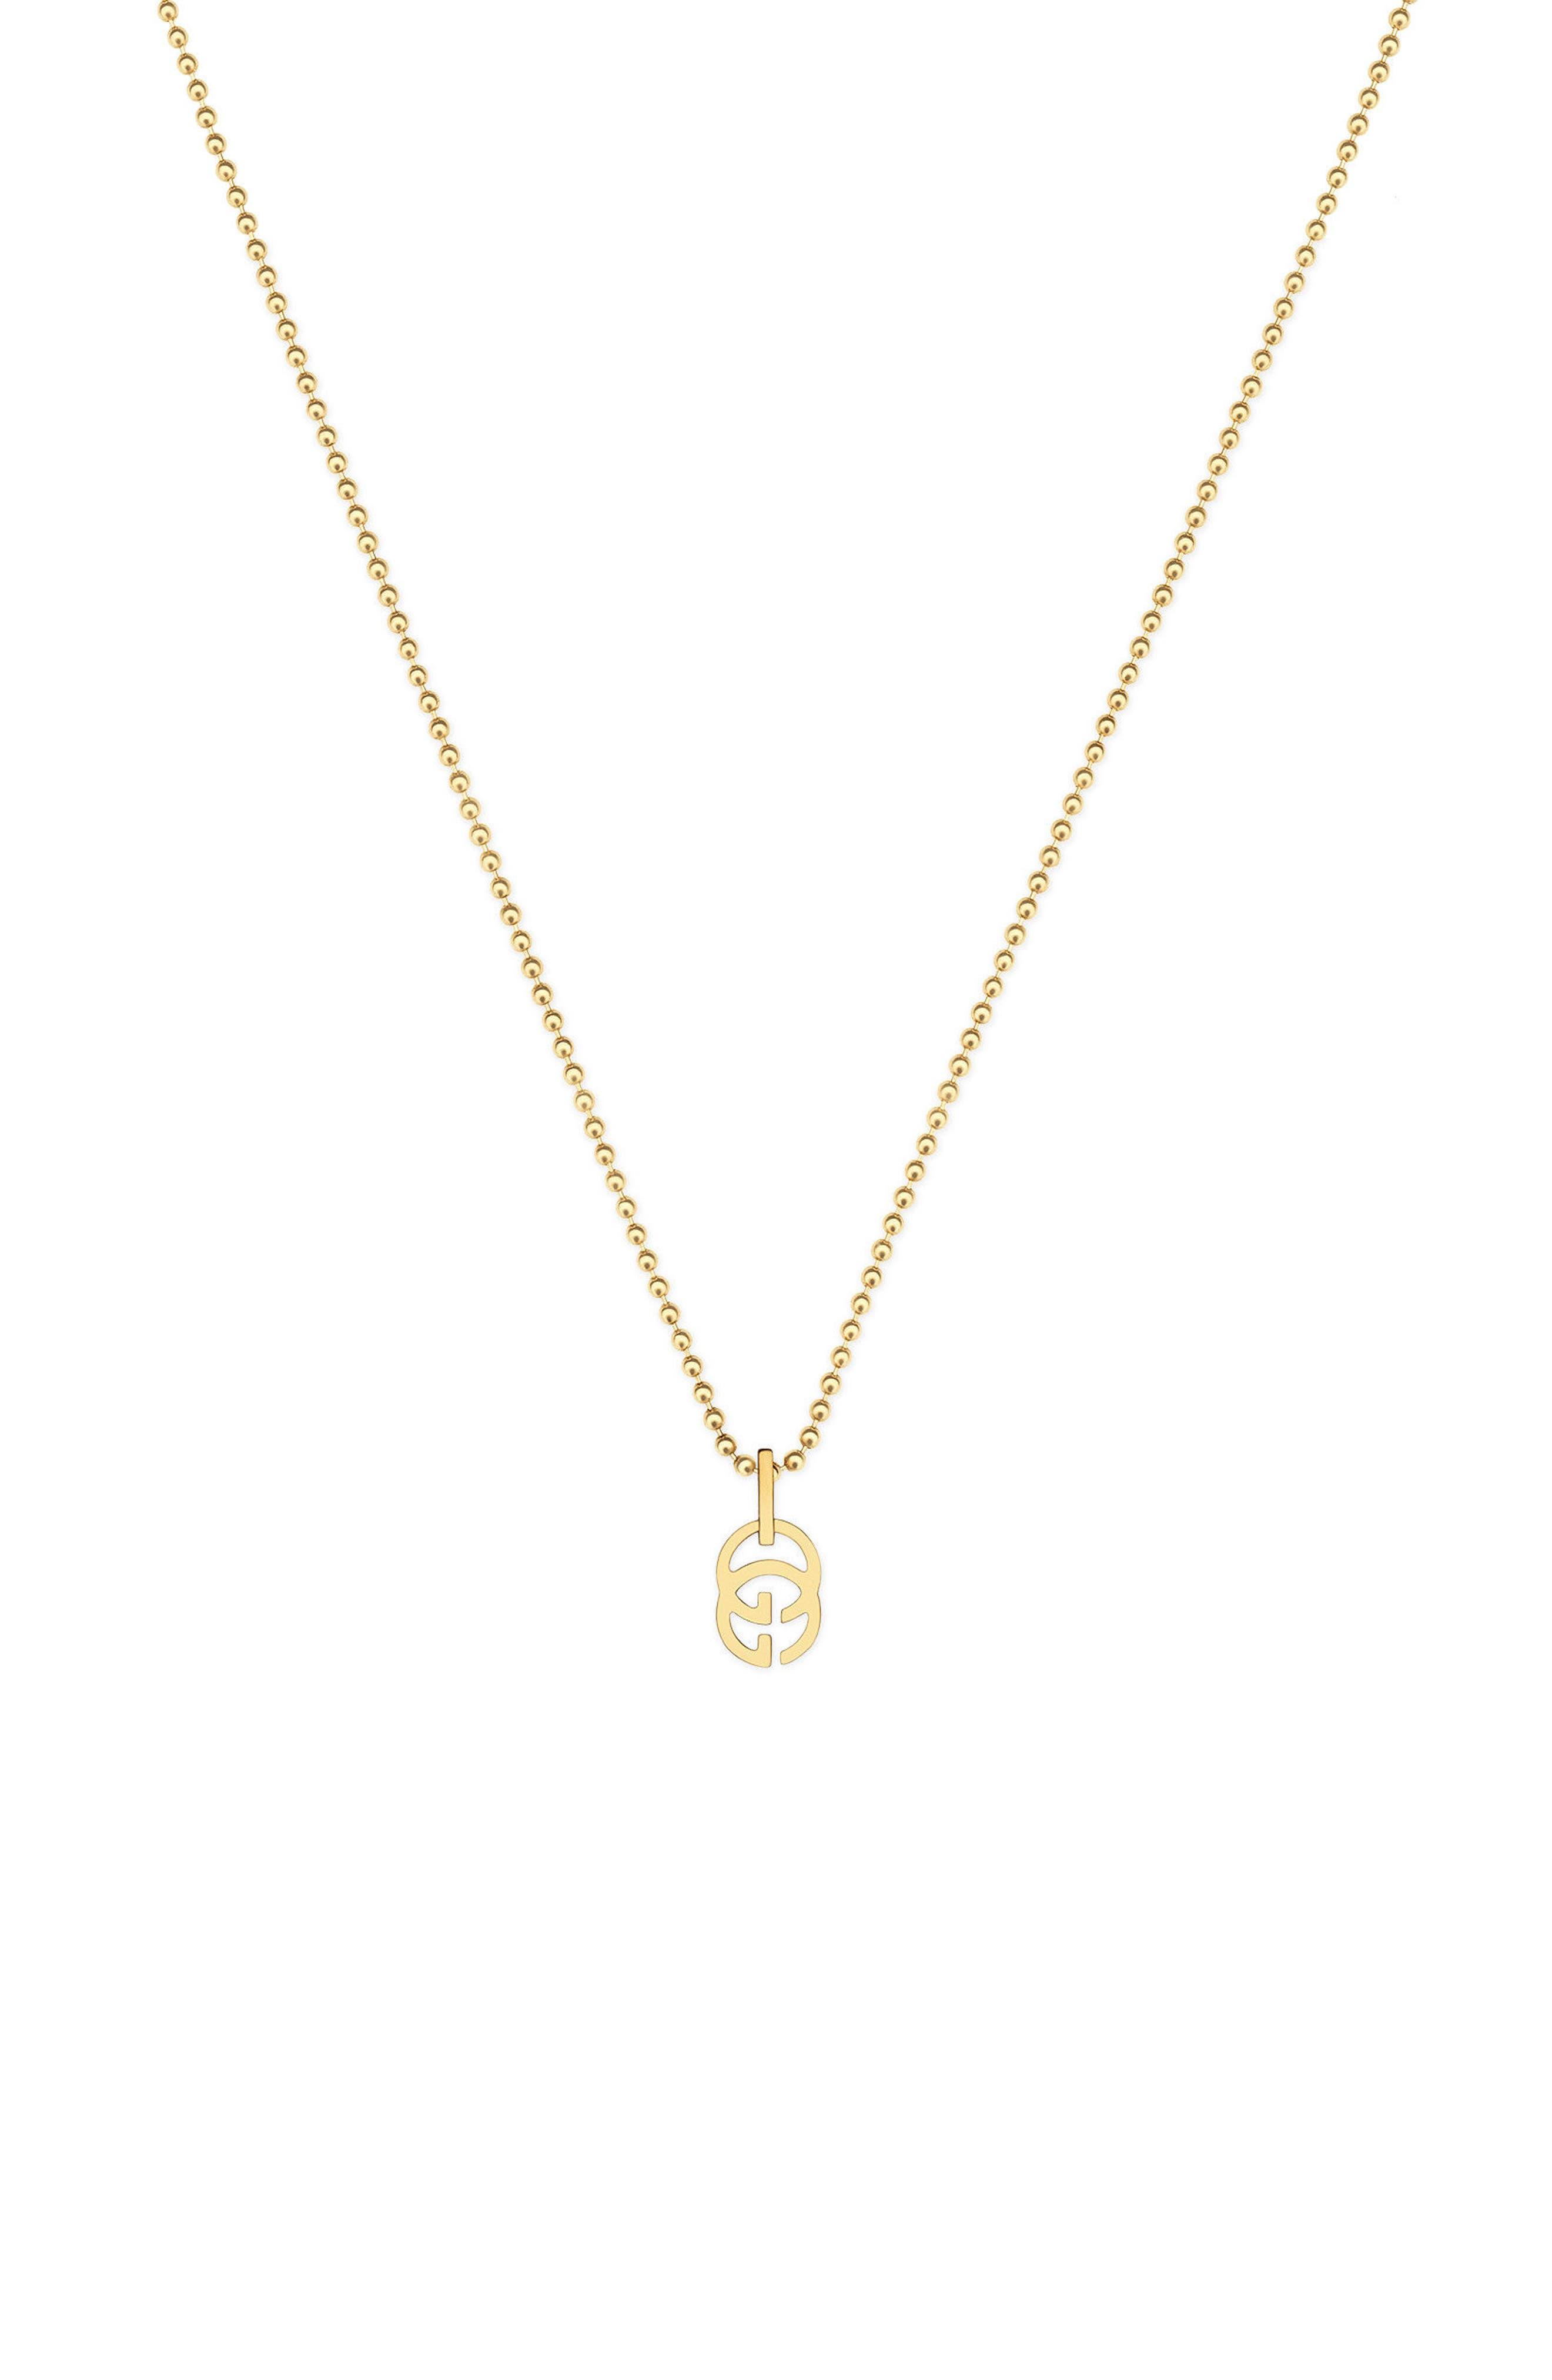 Main Image - Gucci Double-G Pendant Necklace